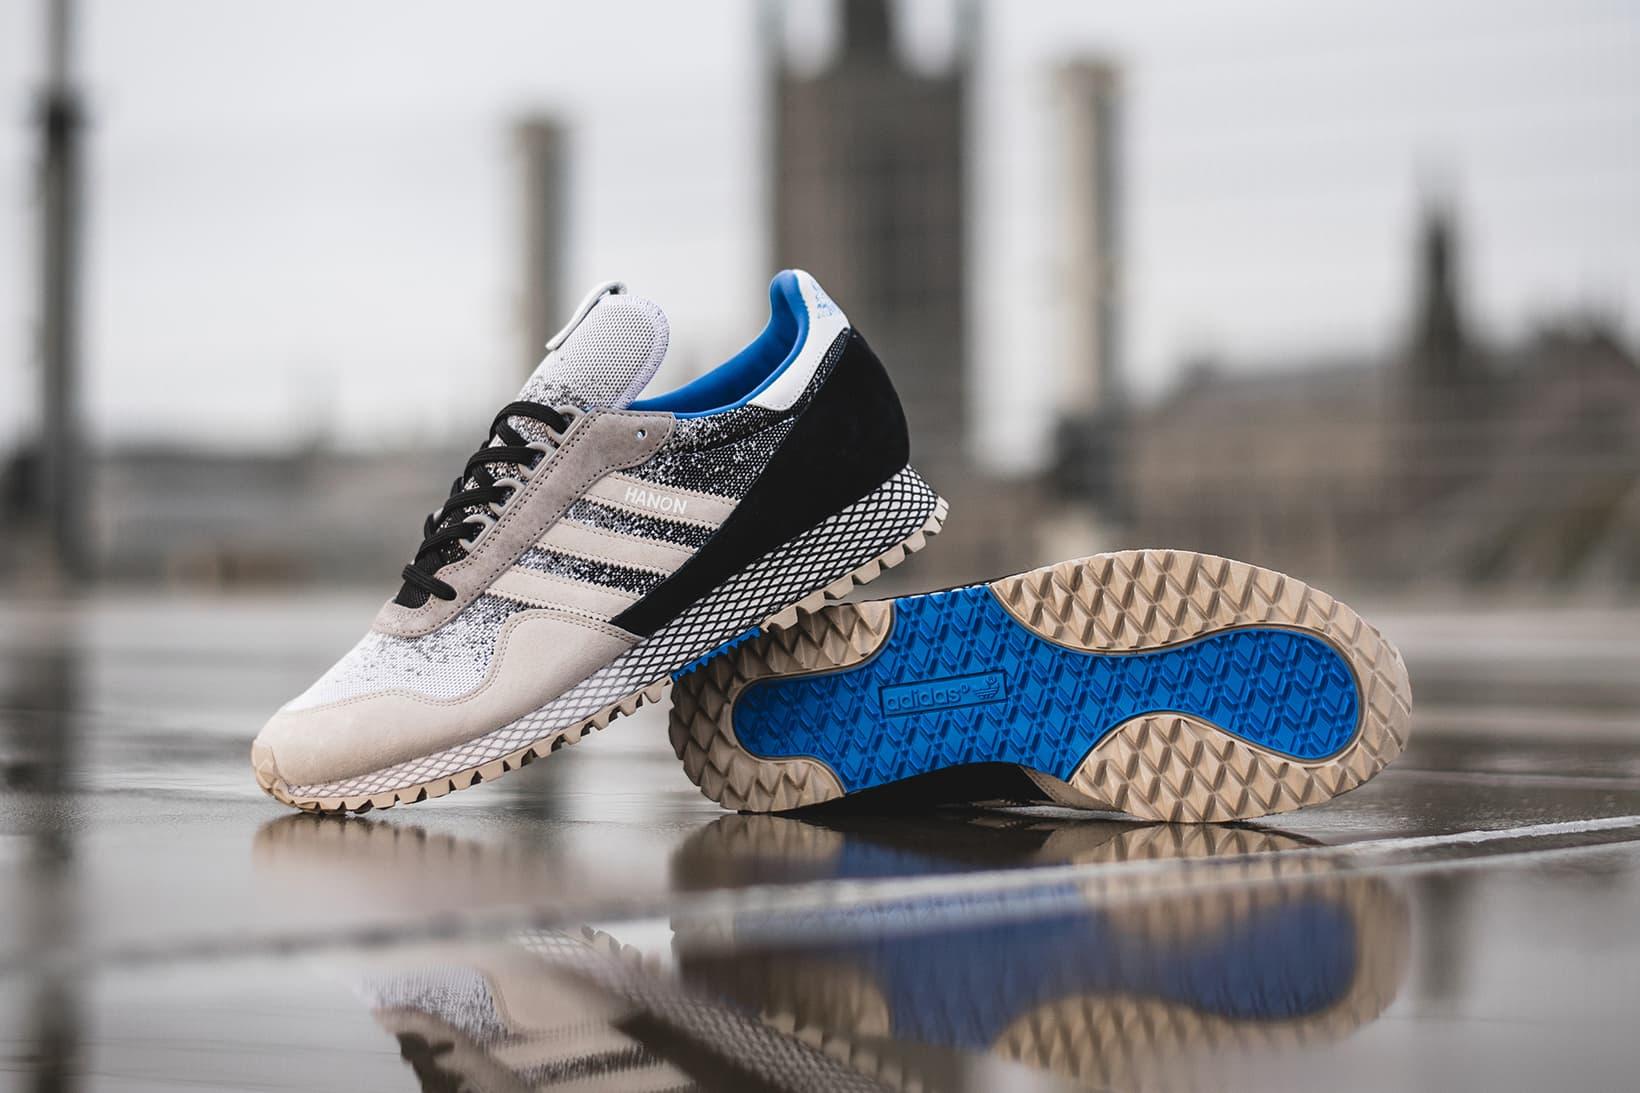 Hanon Reworks the adidas New York With Seasonal Flair